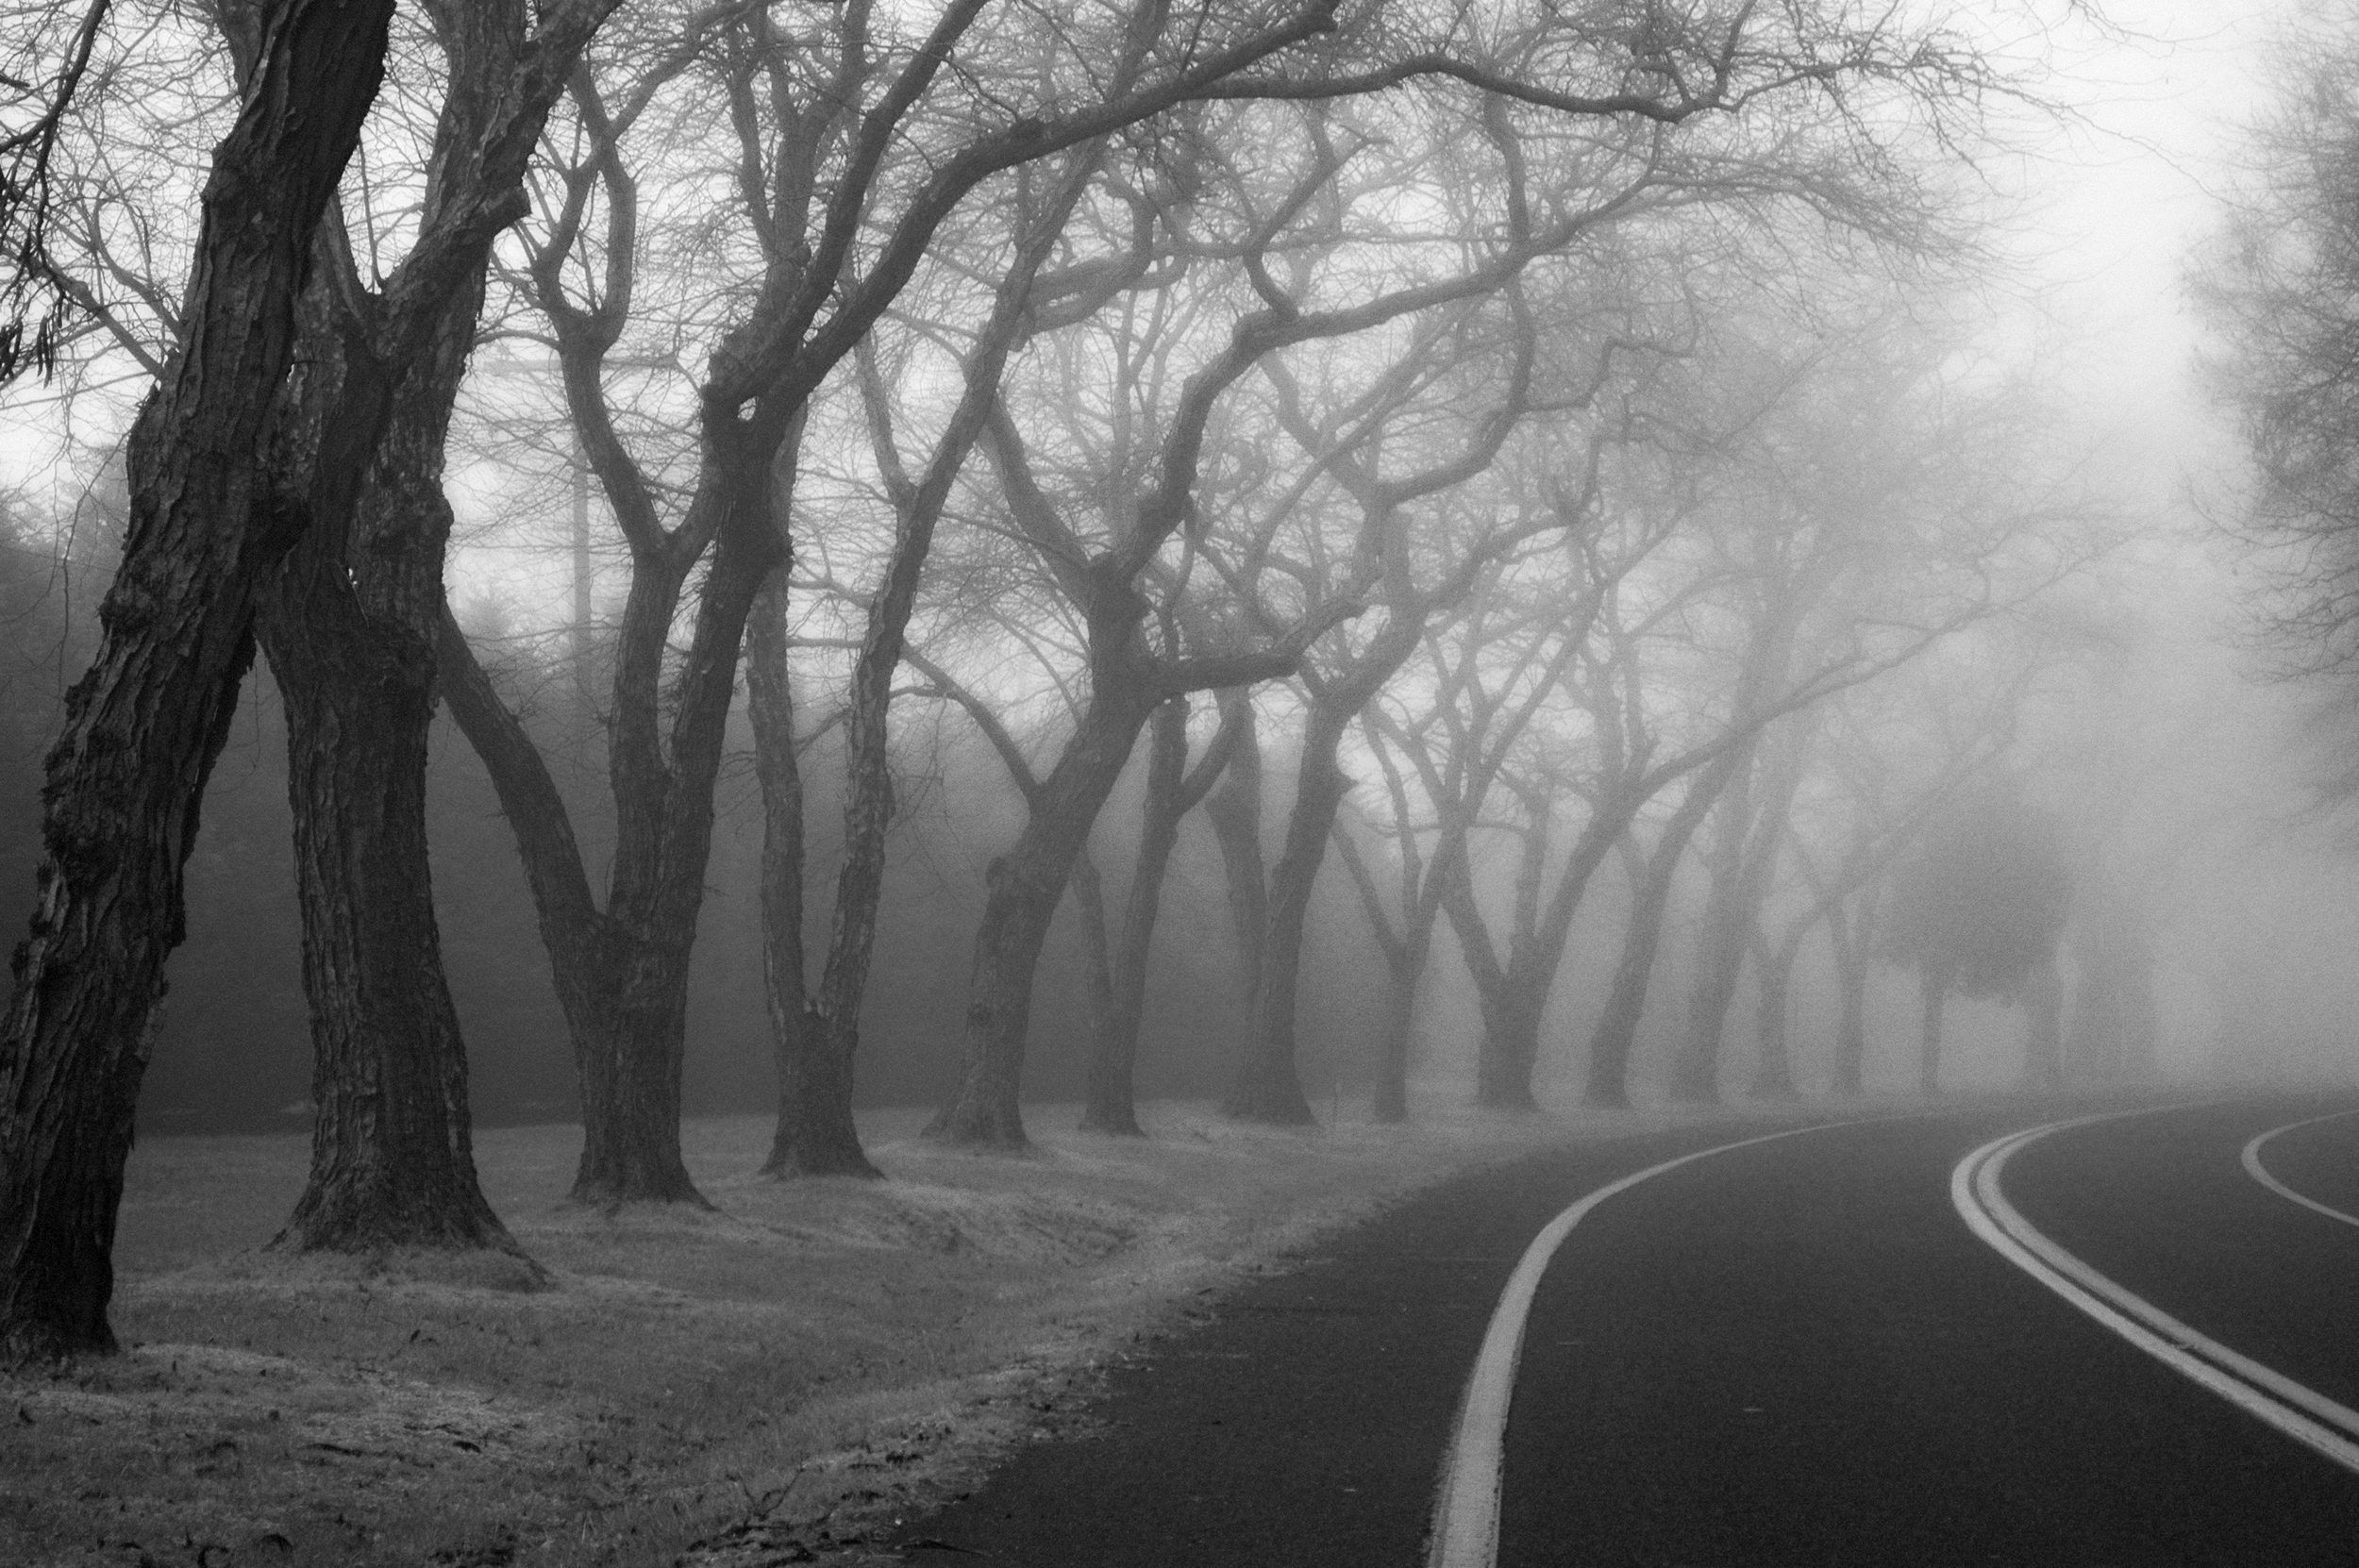 On Delmarva: Assateague Road